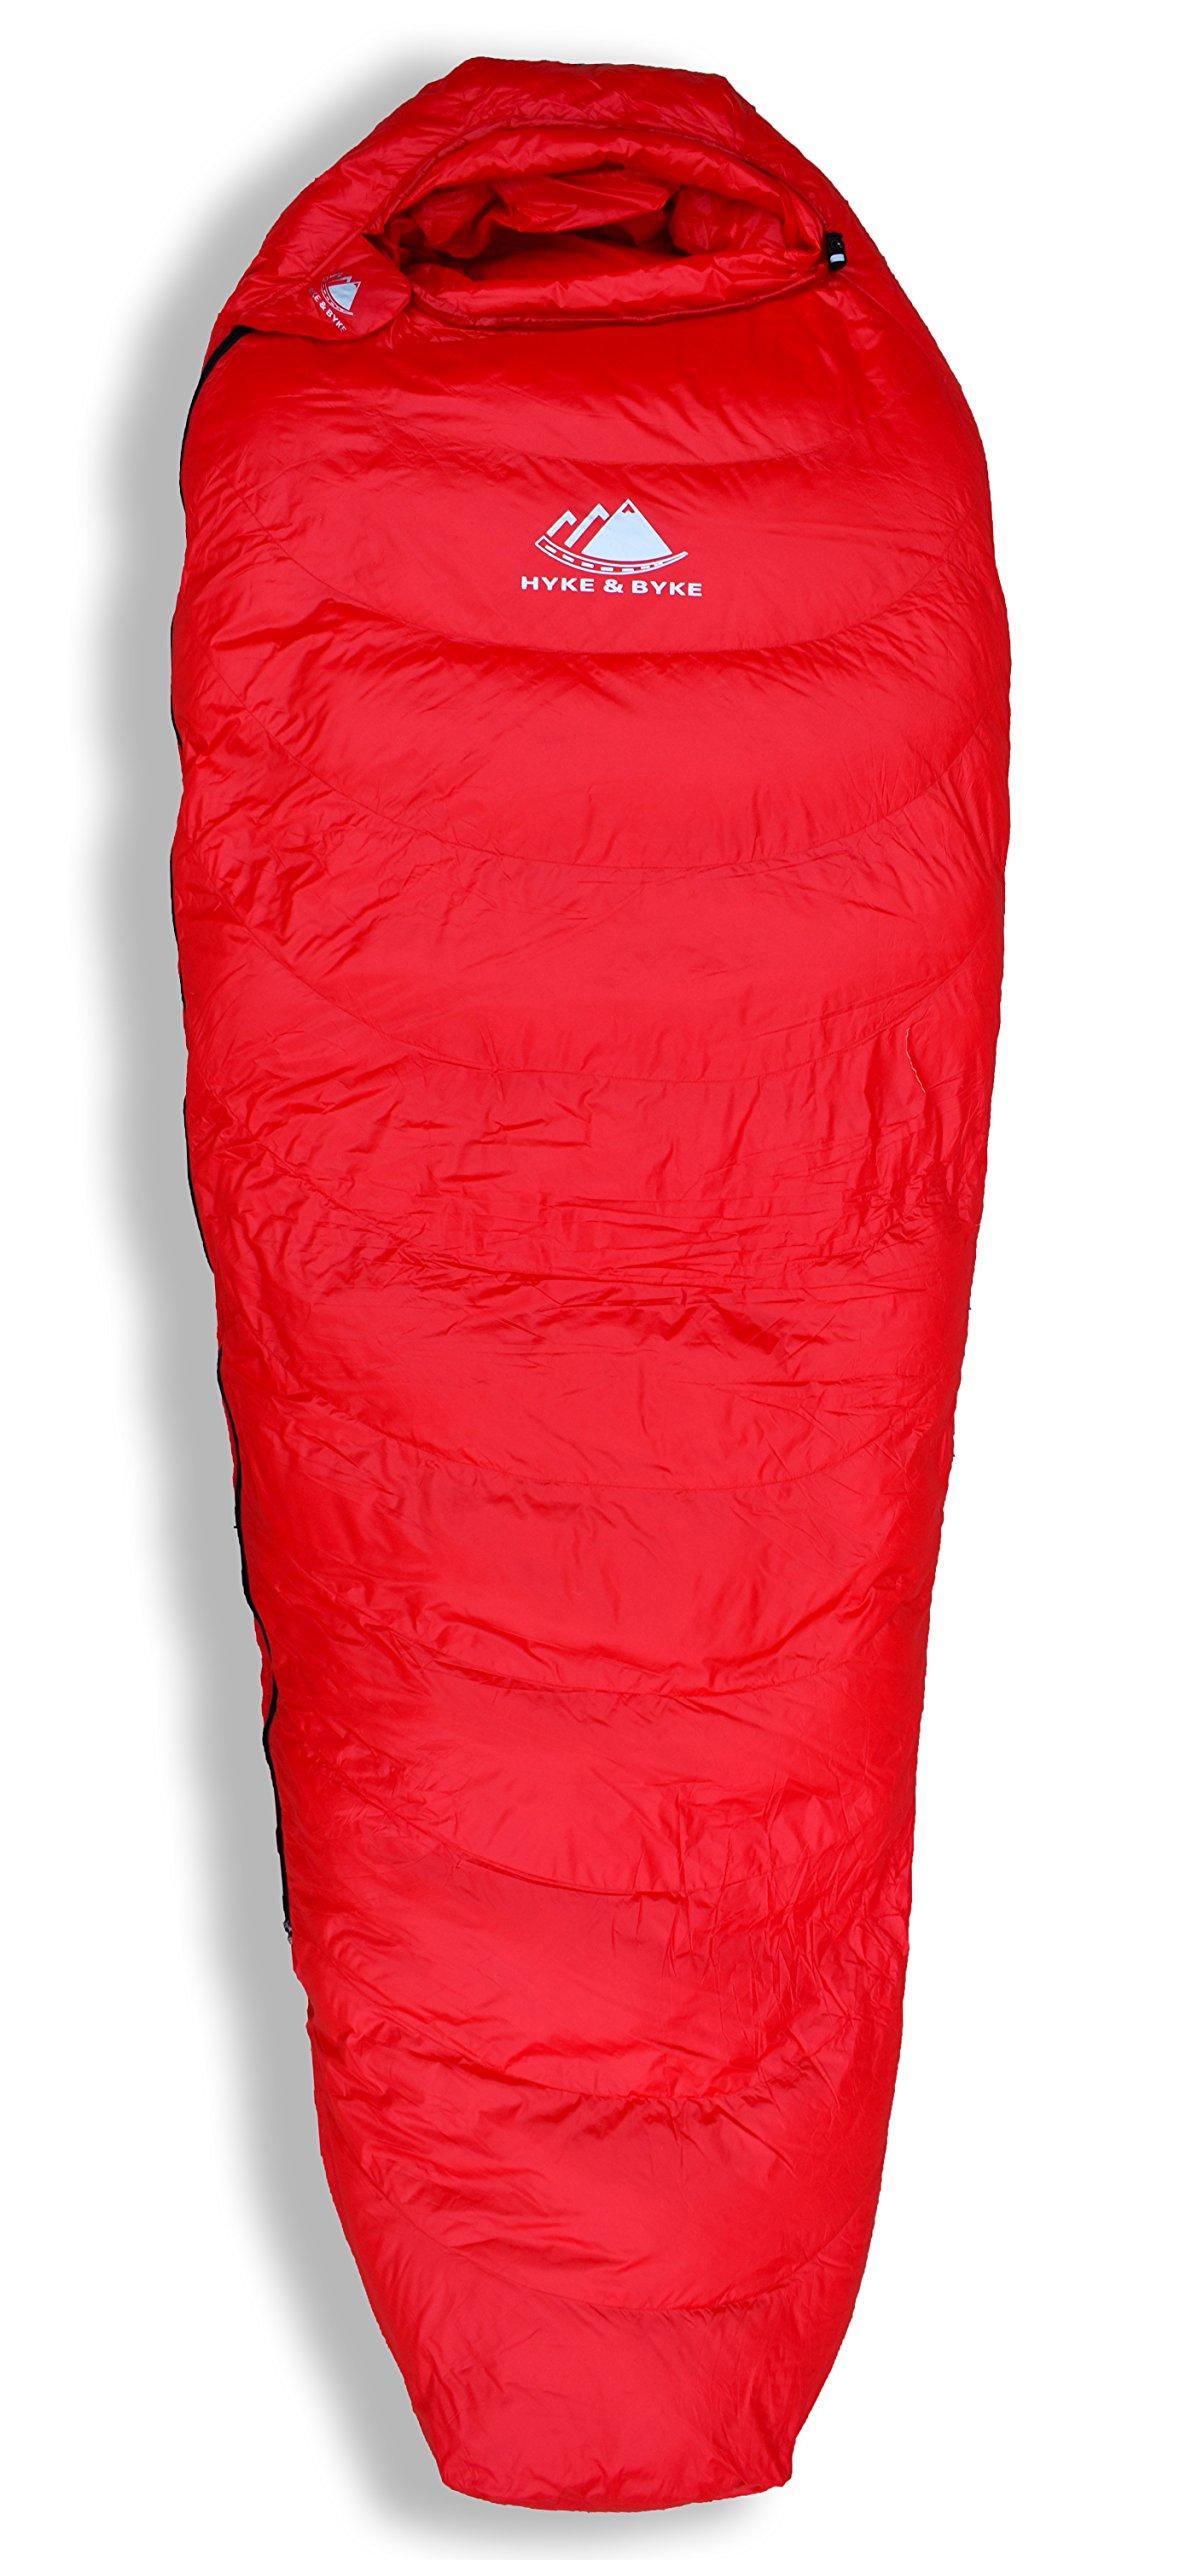 Hyke & Byke Quandary 15 Degree F 650 Fill Power Hydrophobic Down Sleeping Bag with ClusterLoft Base - Ultra Lightweight 3 Season Men's and Women's Mummy Bag Designed for Backpacking 8